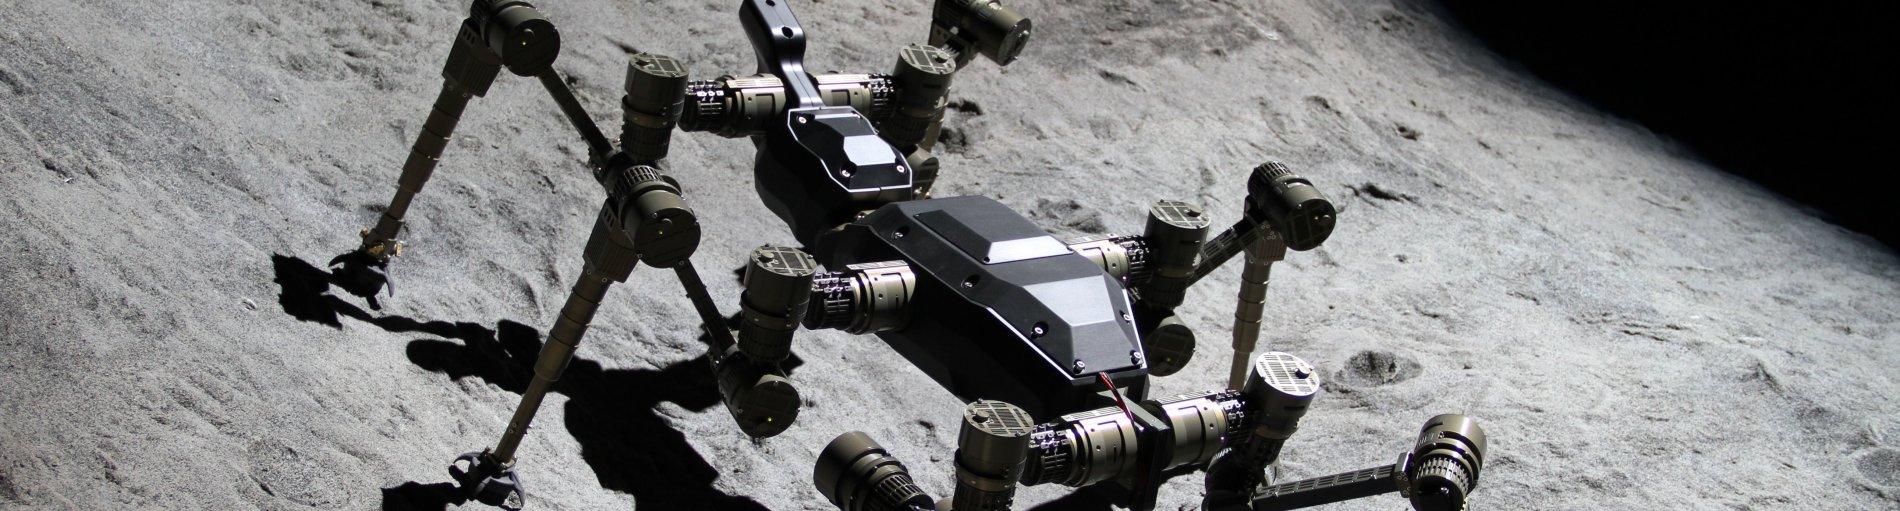 Ein freikletternder Roboter